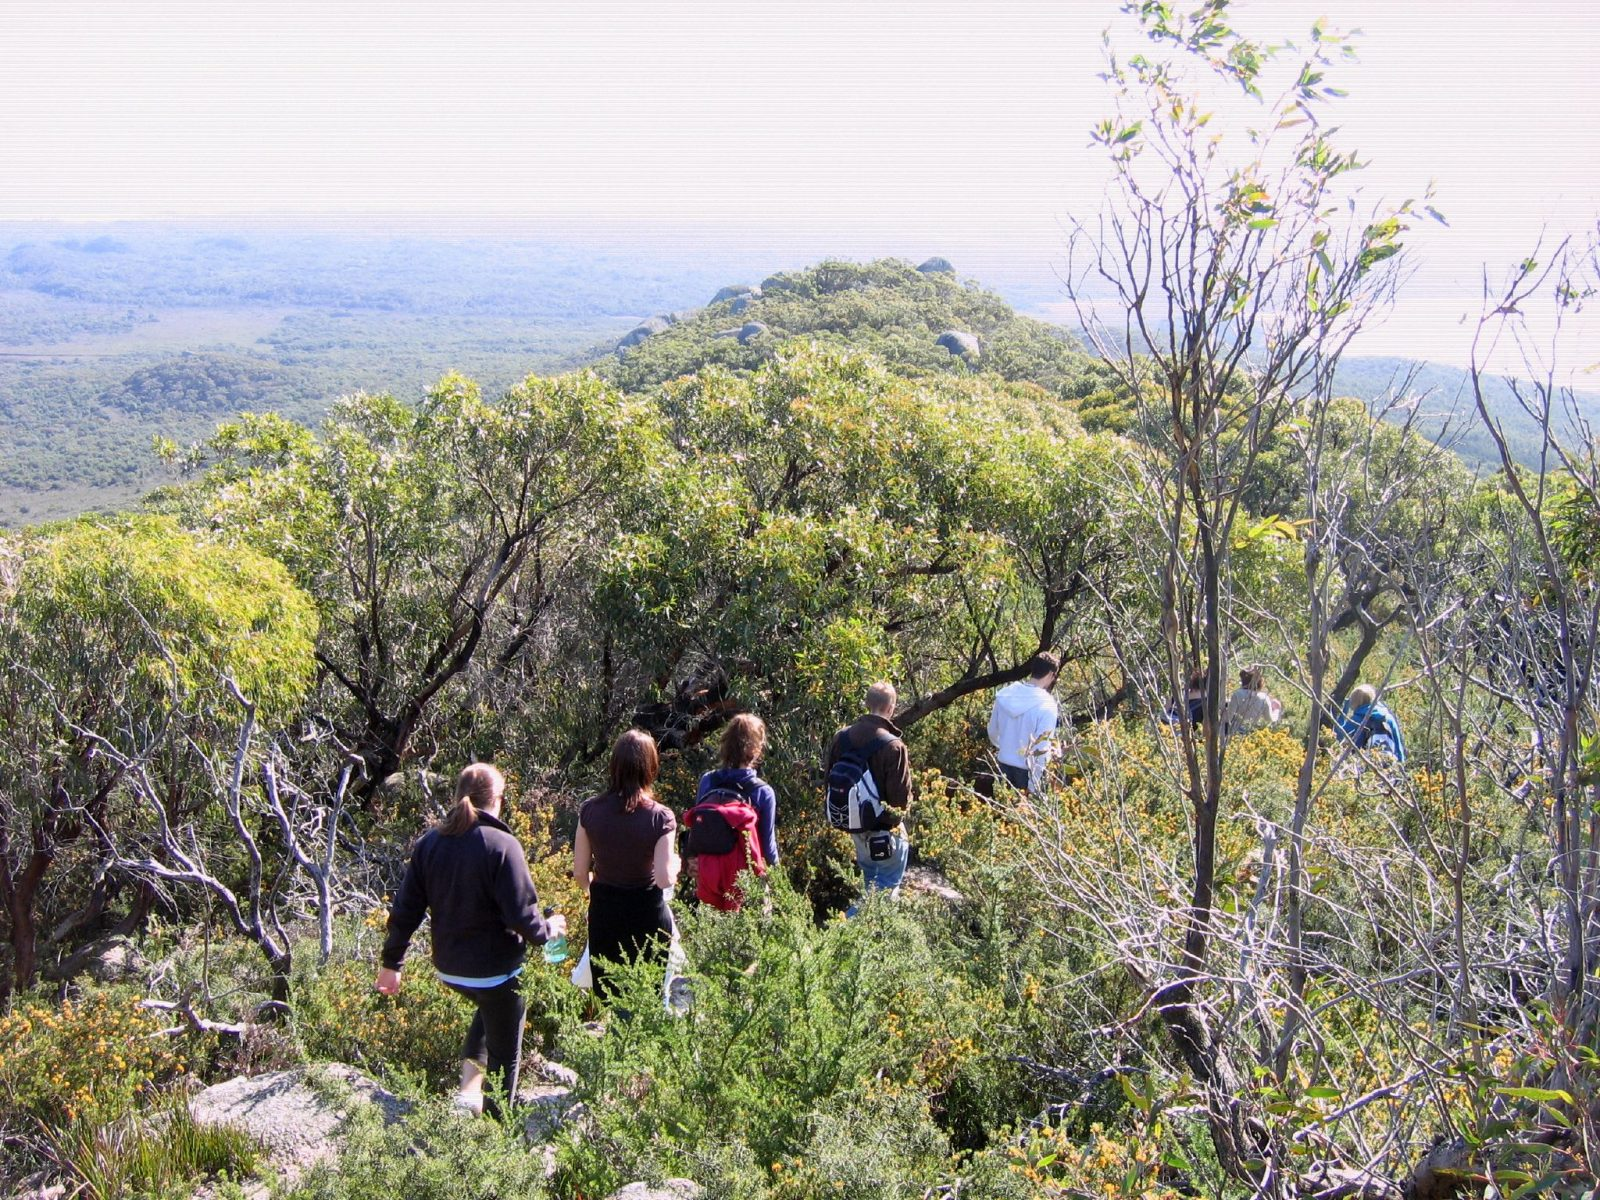 Vereker Outlook - Wilsons Promontory - Victoria - Australia